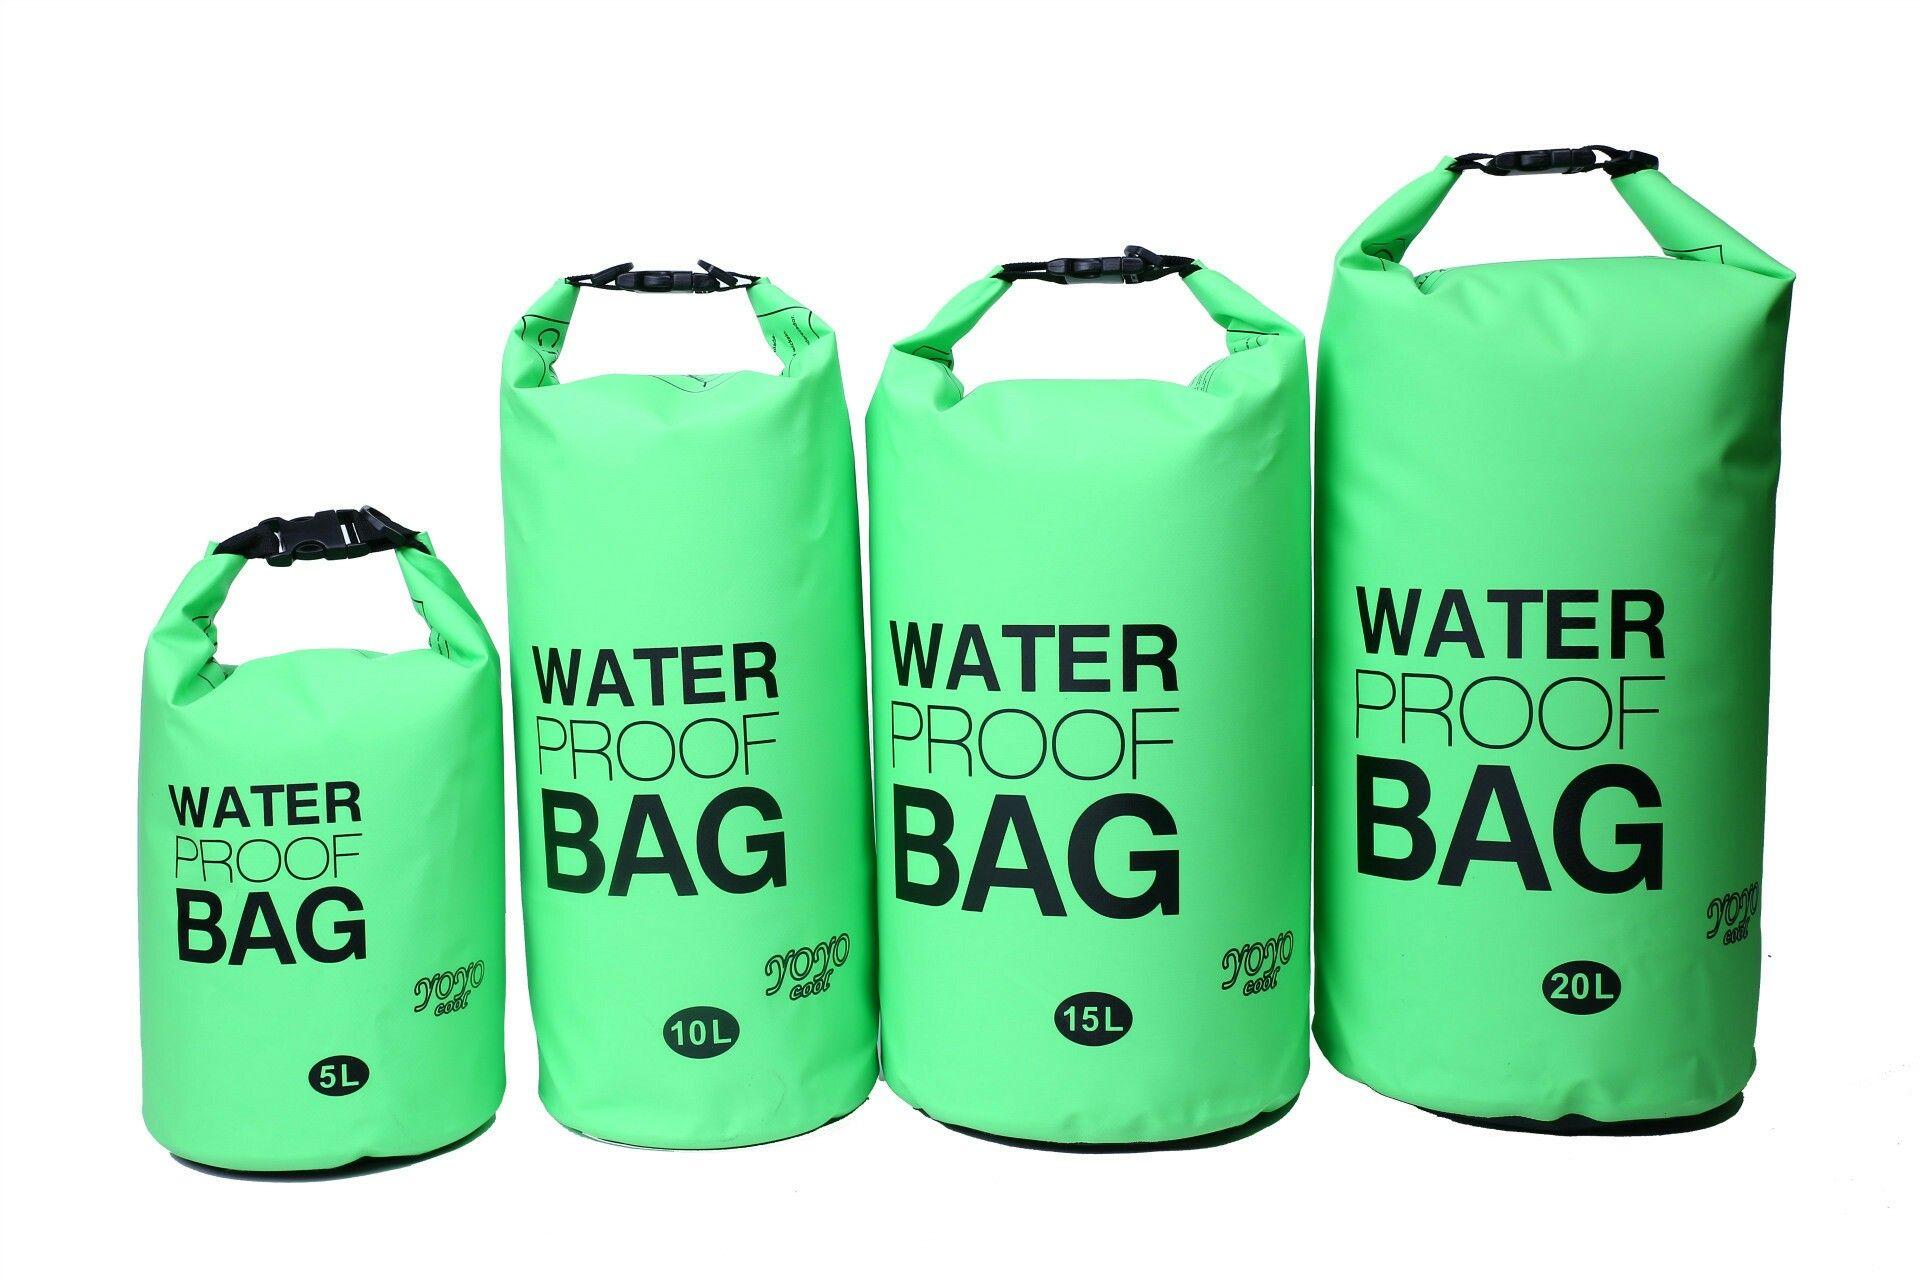 Order Via Whatsapp On 008613771929247 I Can Deliver Tnt Dhl Usp Fedex Sf Express Aramex By Sea By Air Waterproof Dry Bag Waterproof Bags Bags